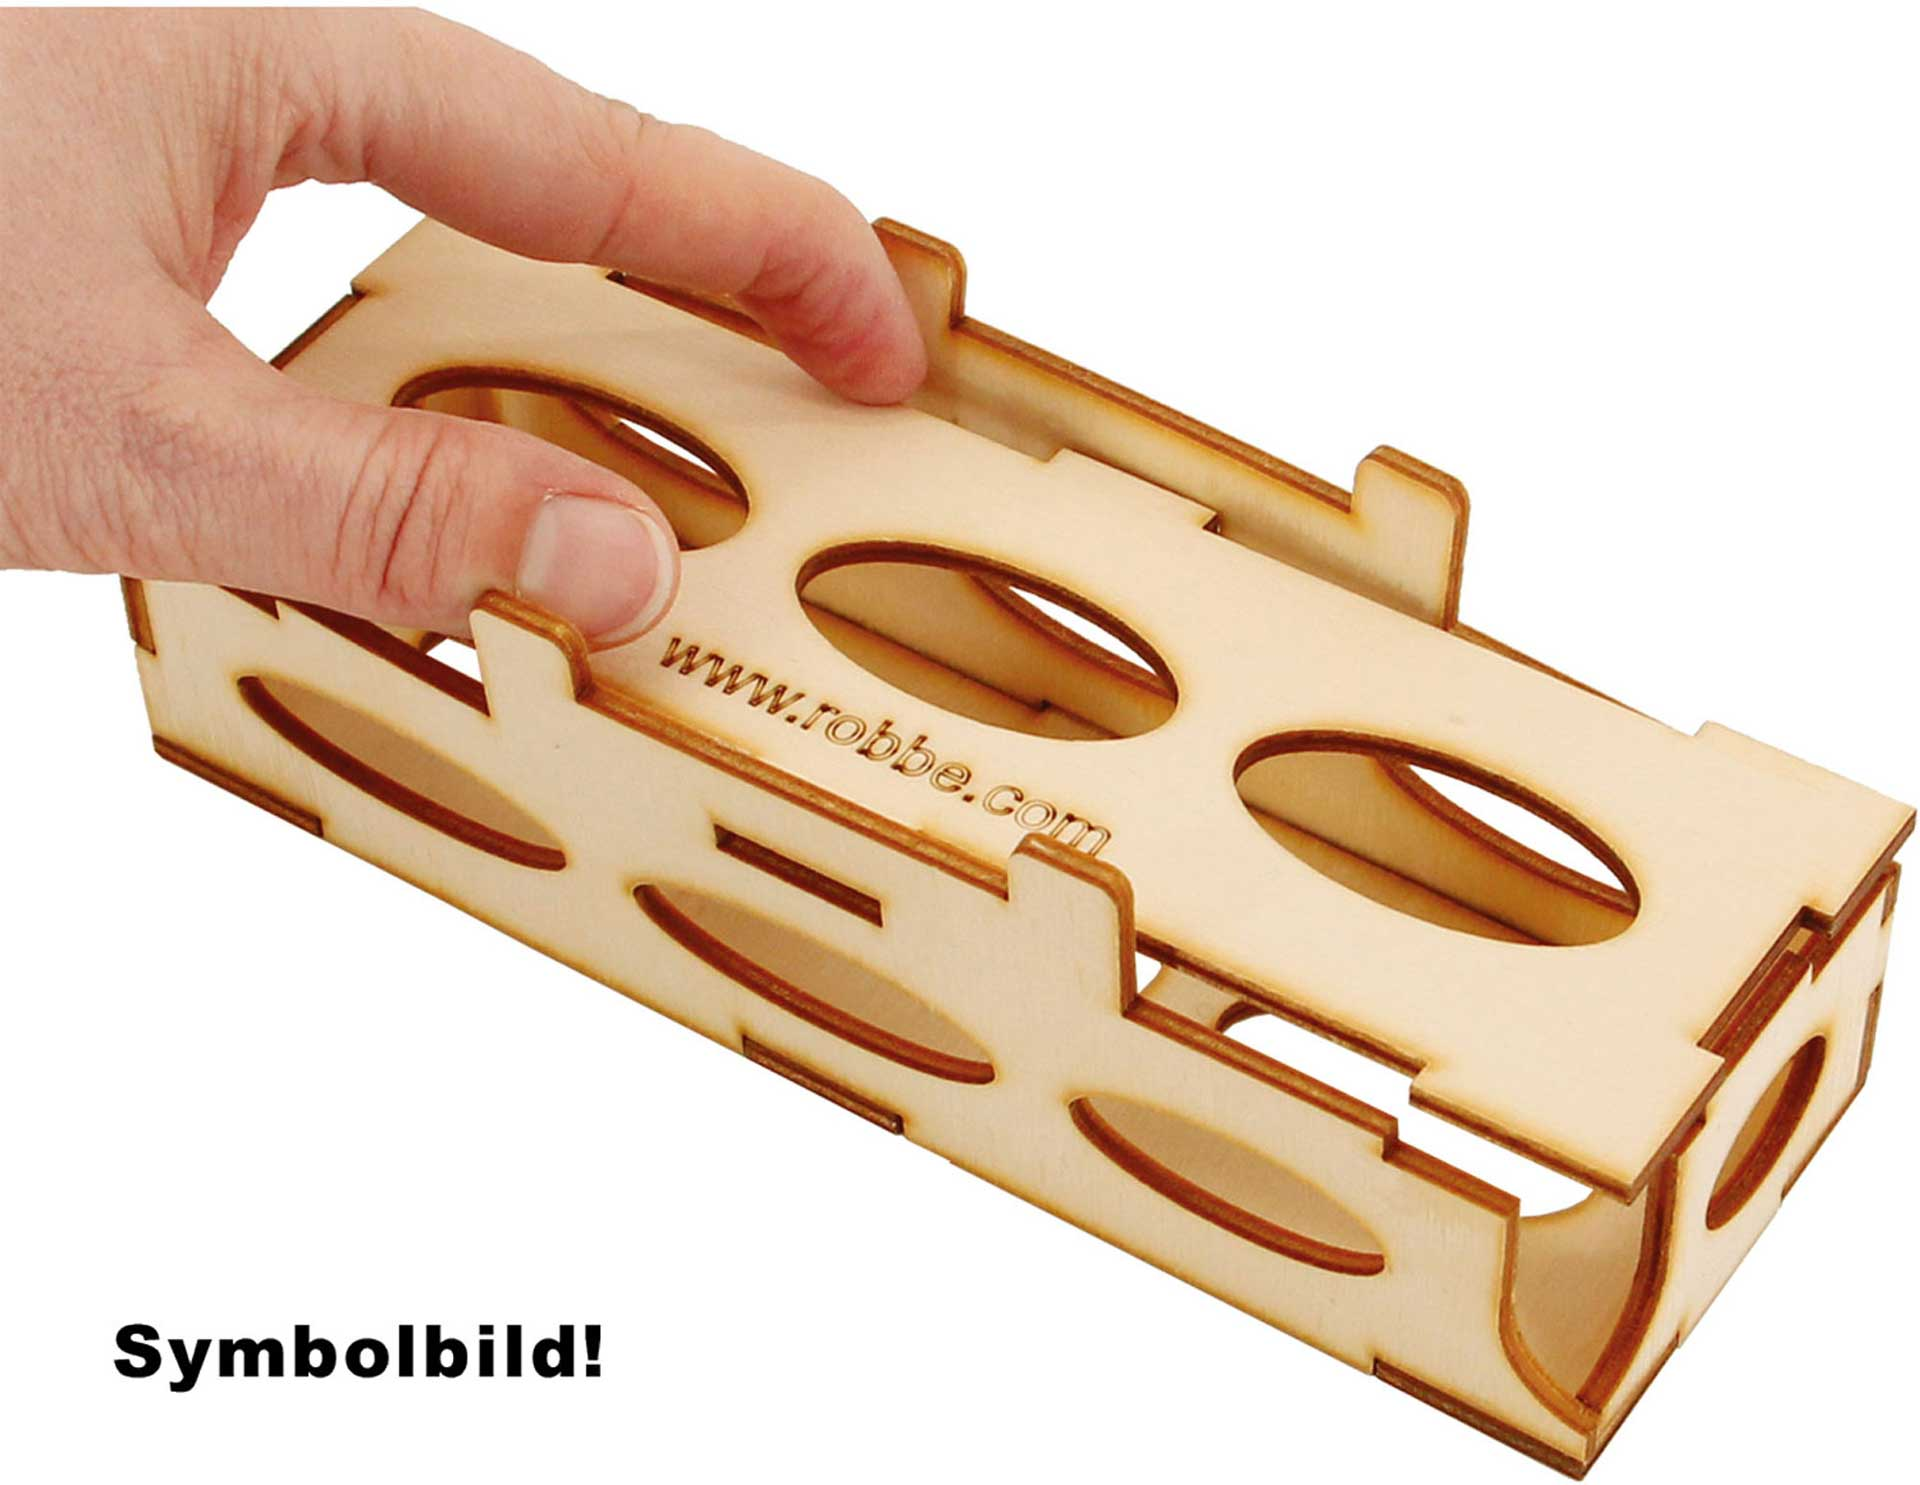 ROBBE AKKUBOX CNC GR. XL